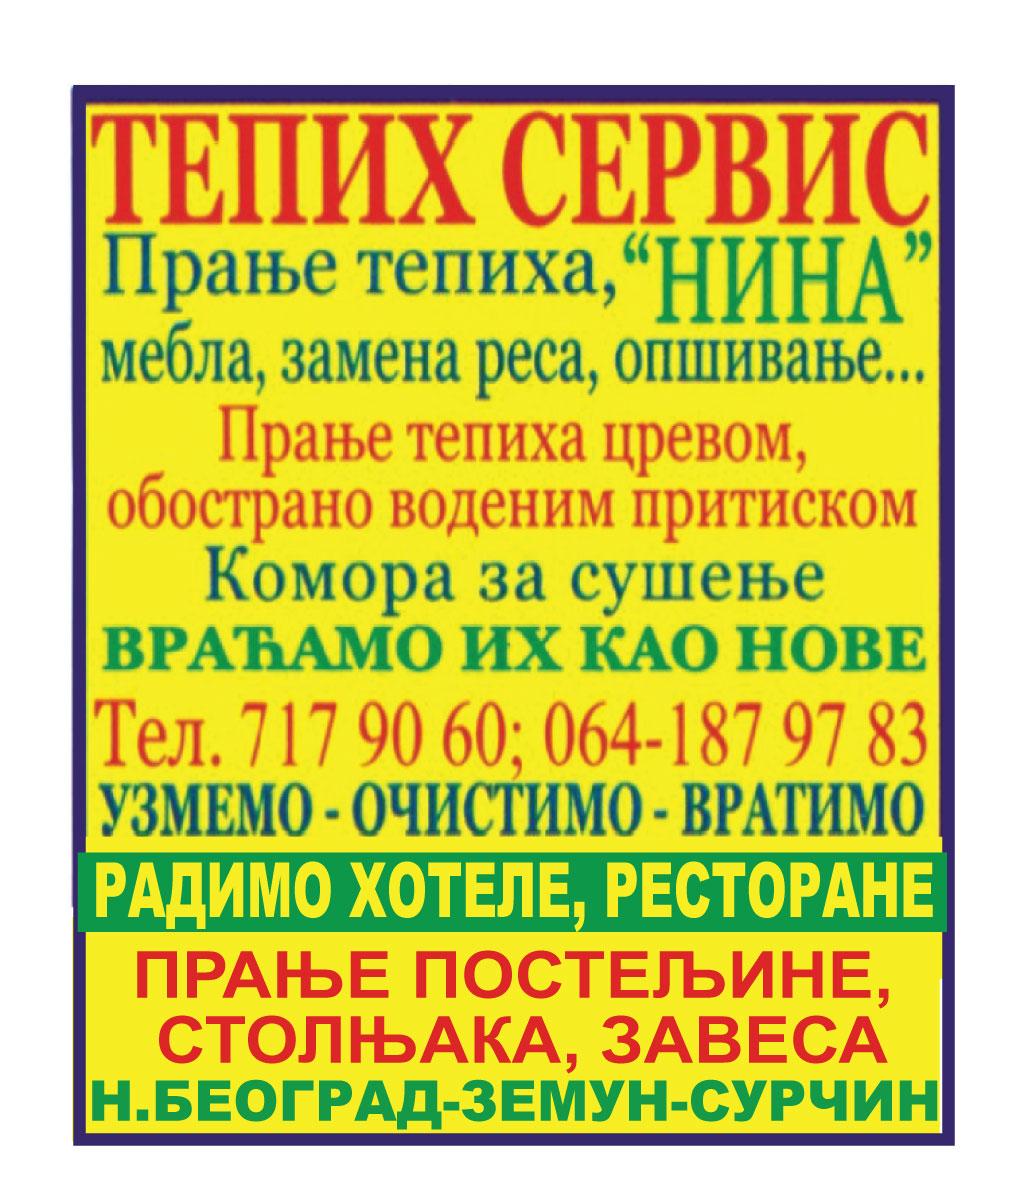 tepih-servis-nina-n&n-surcin-novibgd-zemun-perionica-tepisi-itisoni-cistakuca-mojabaza